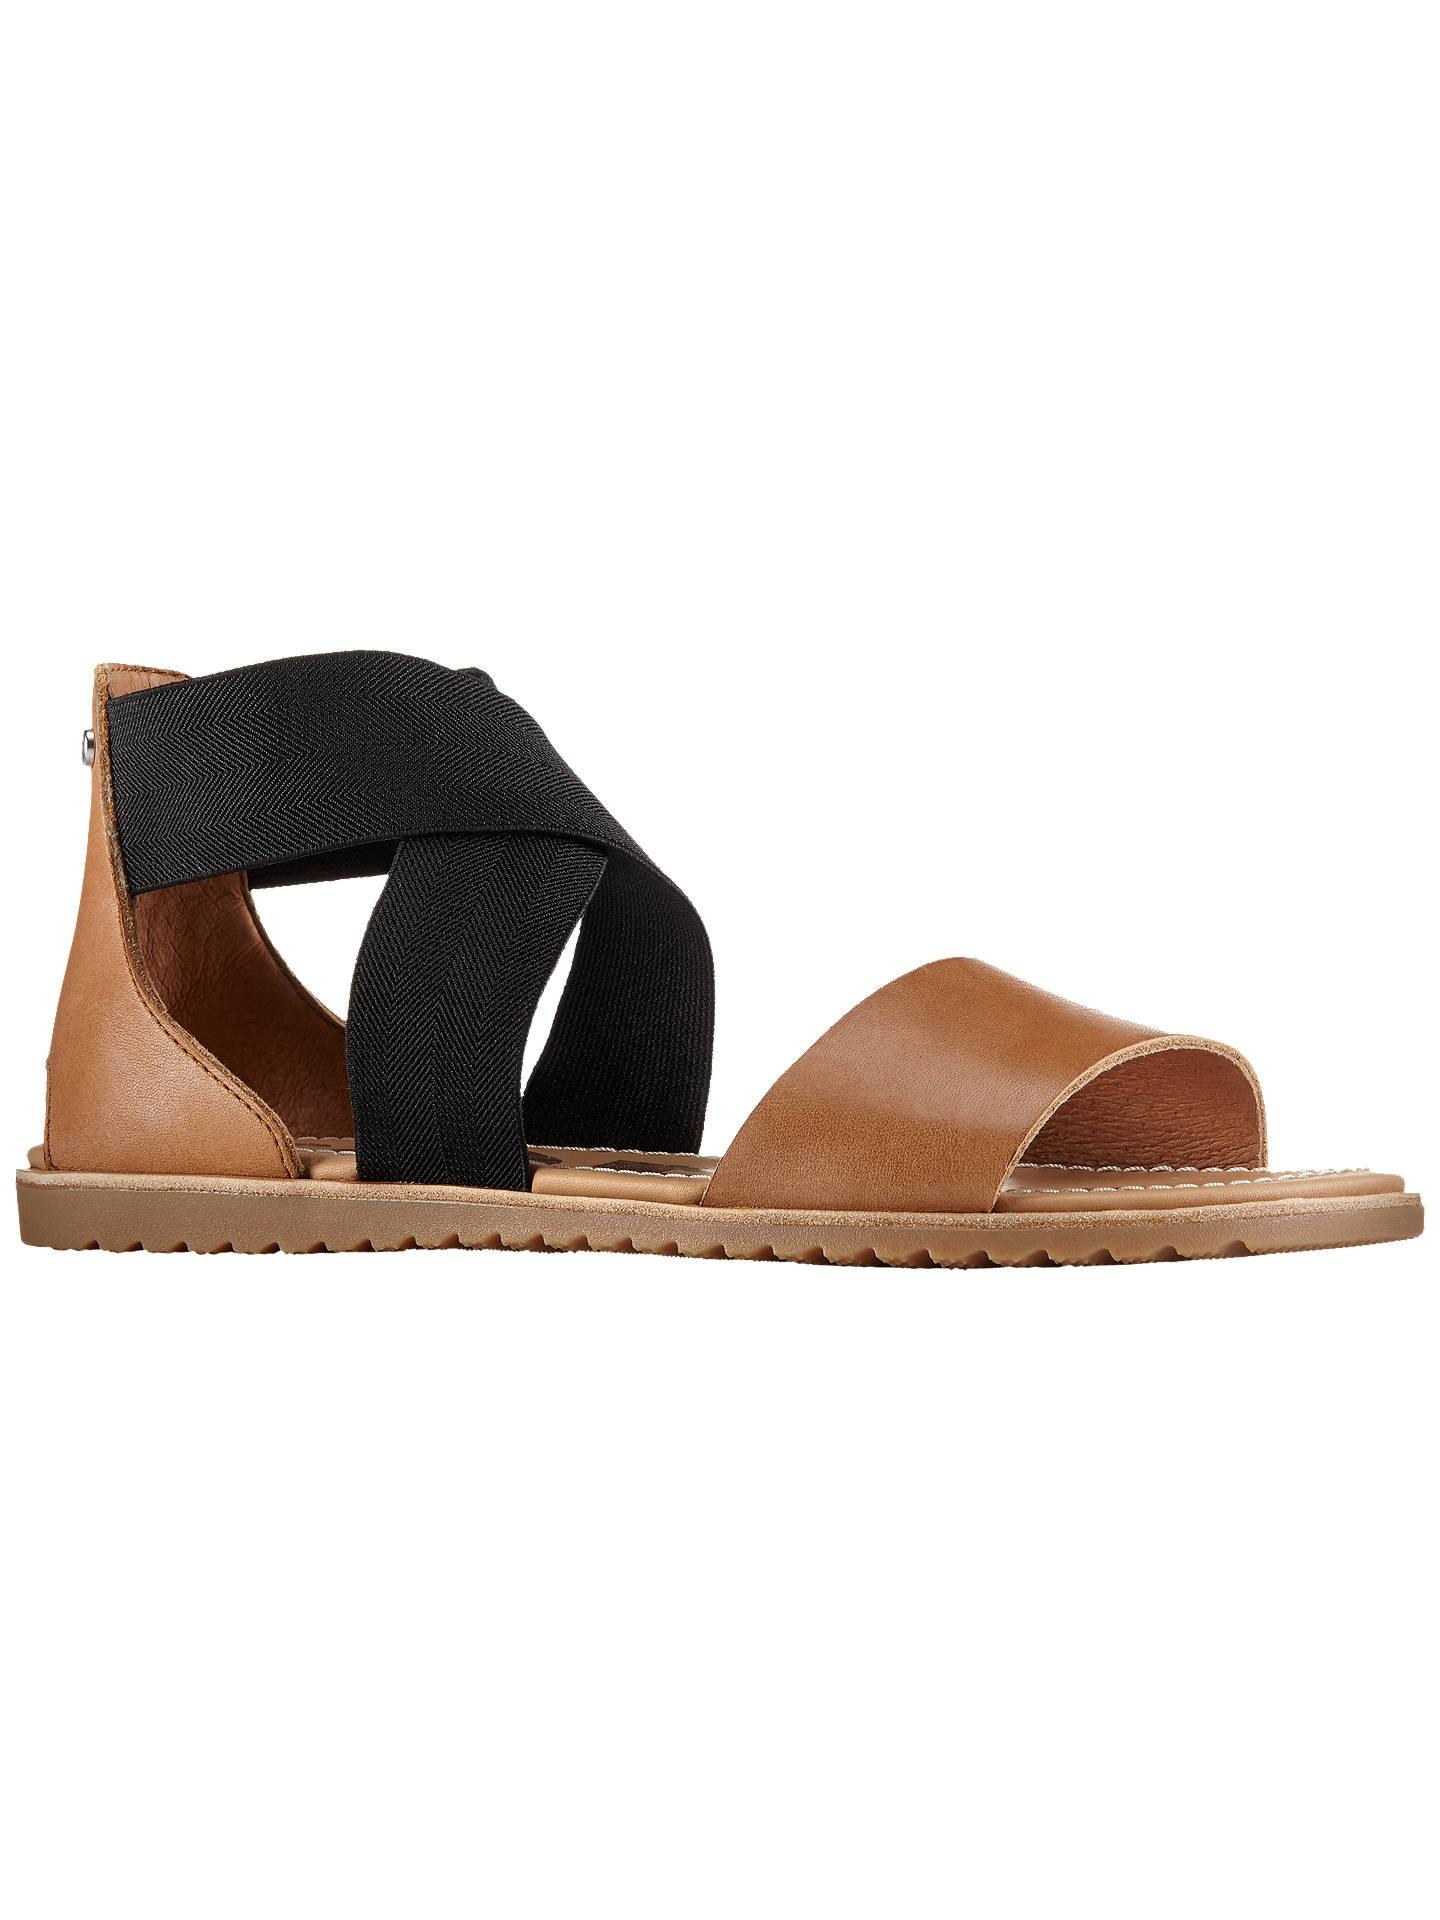 df9cb4547 Sorel Ella Cross Strap Women s Sandals at John Lewis   Partners